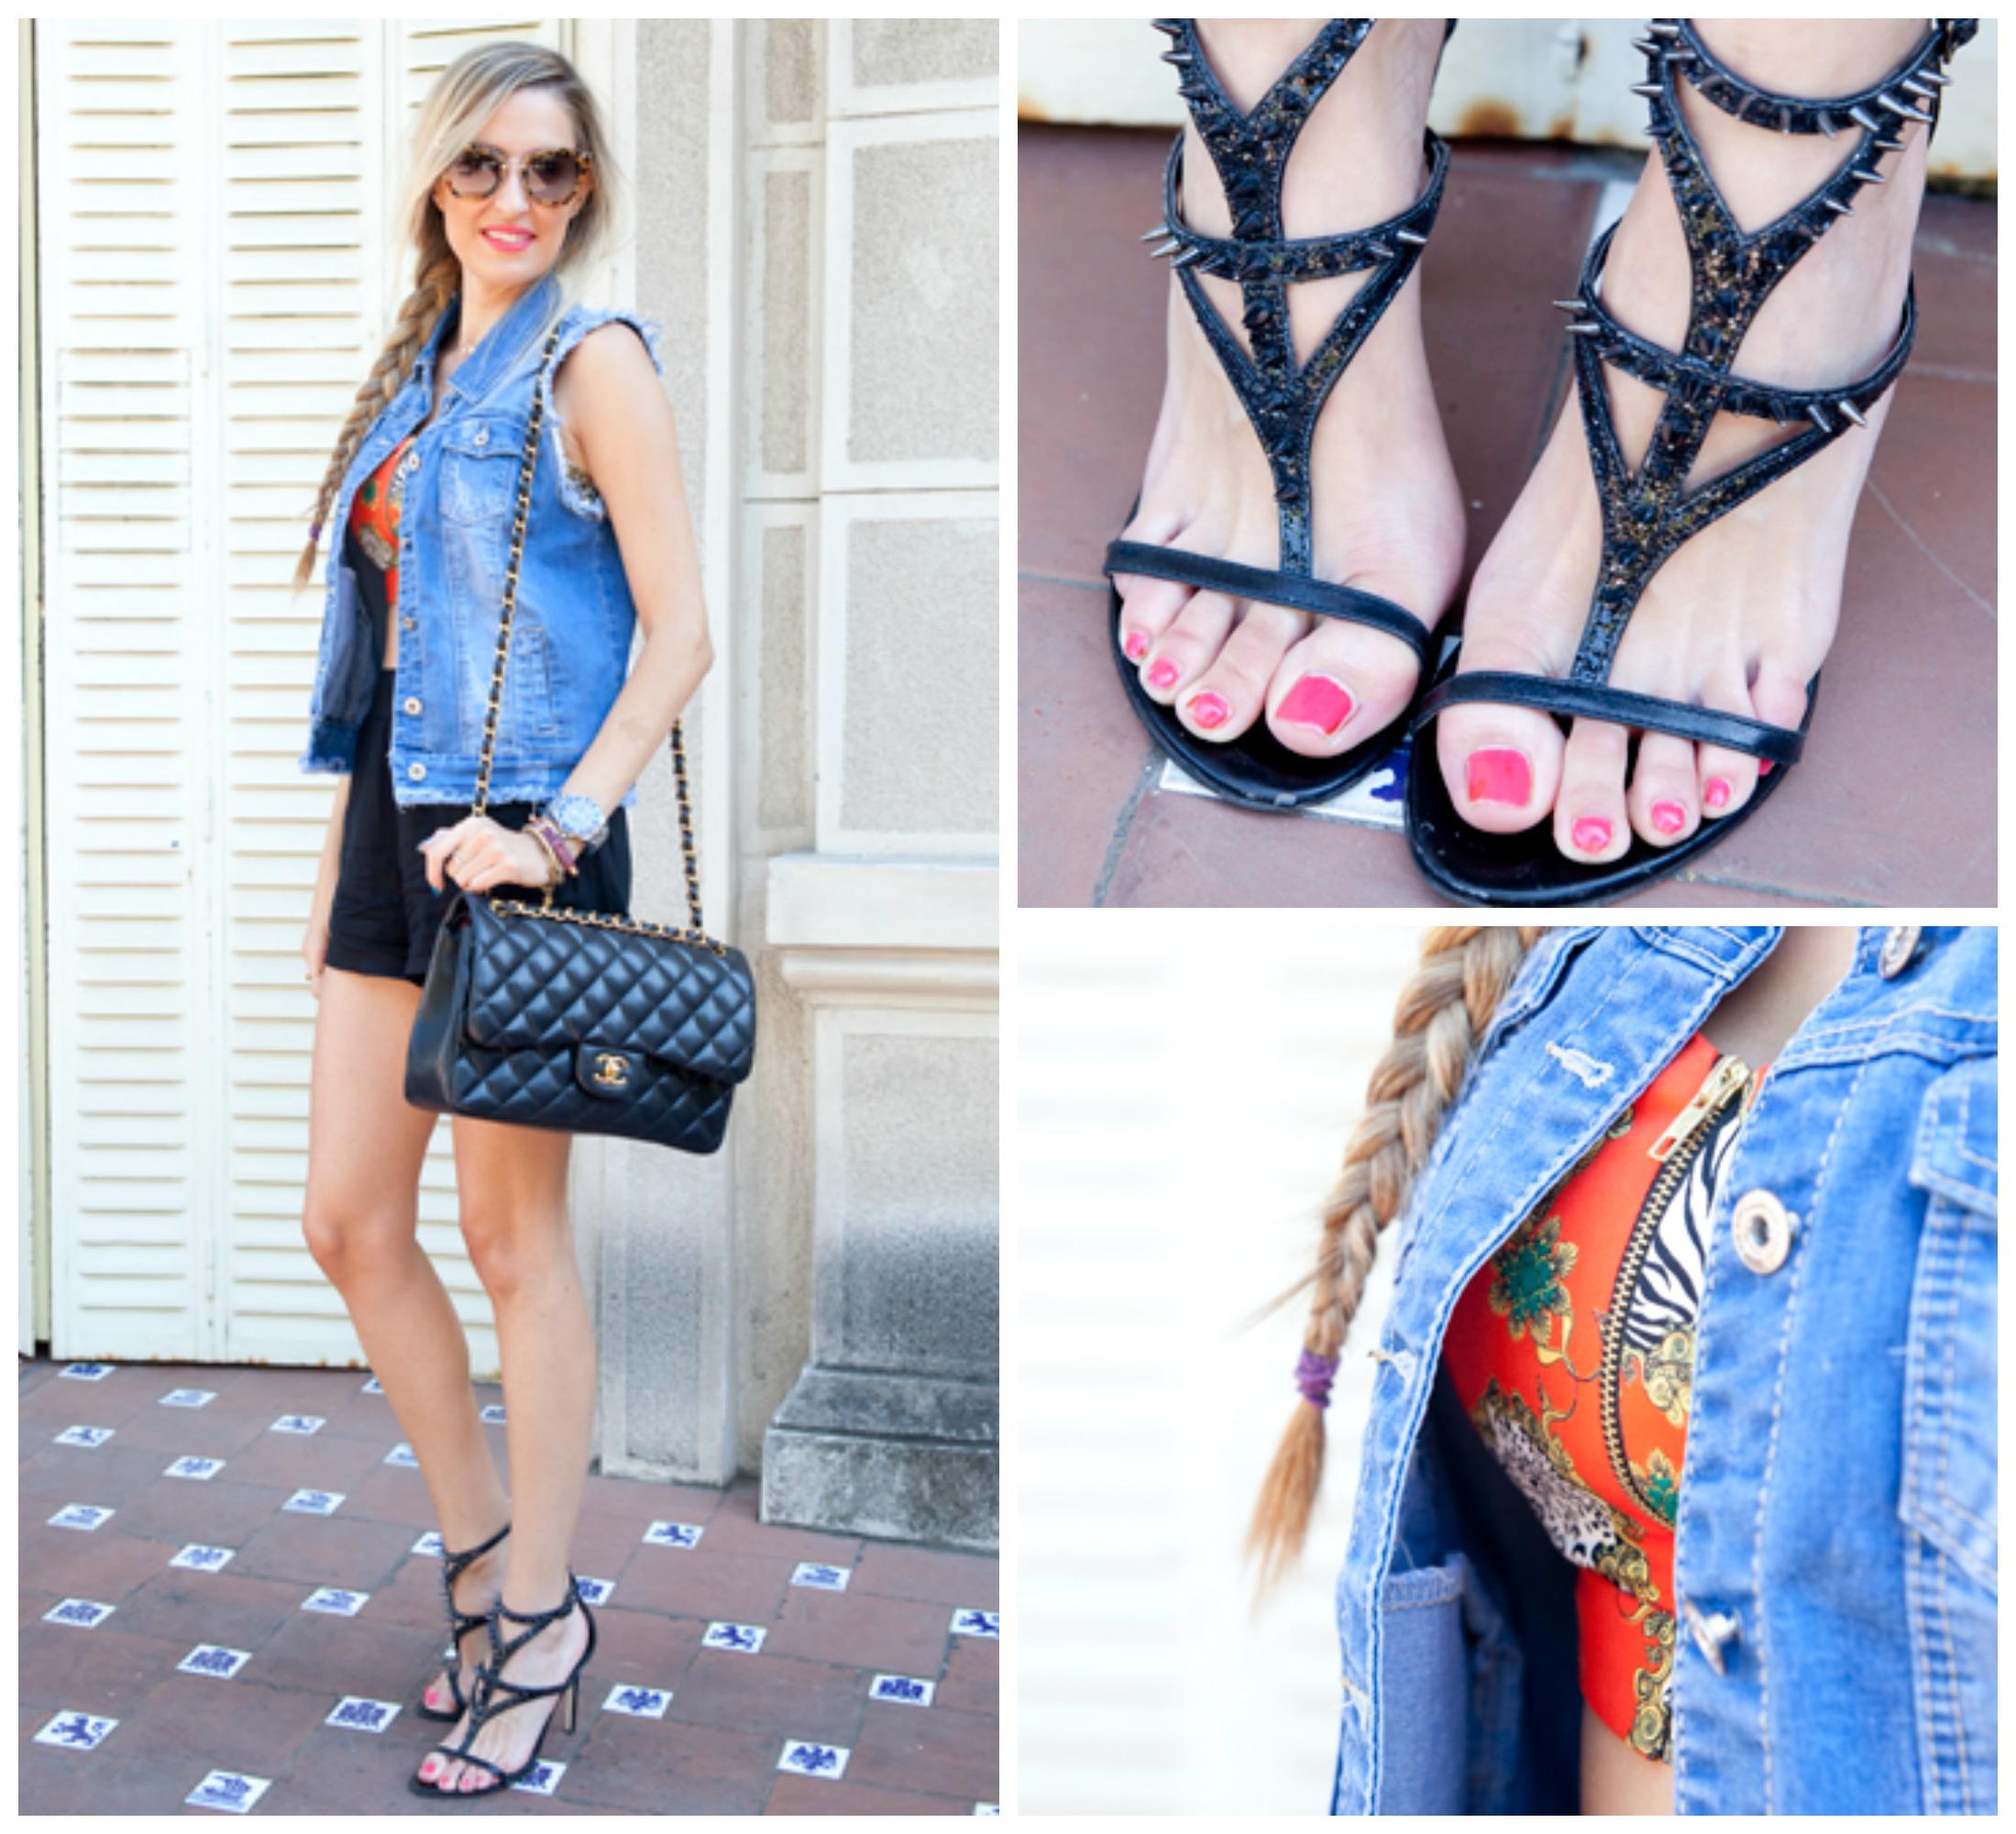 Street_Style_TELVA_Lara_Martin_Gilarranz_Bymyheels